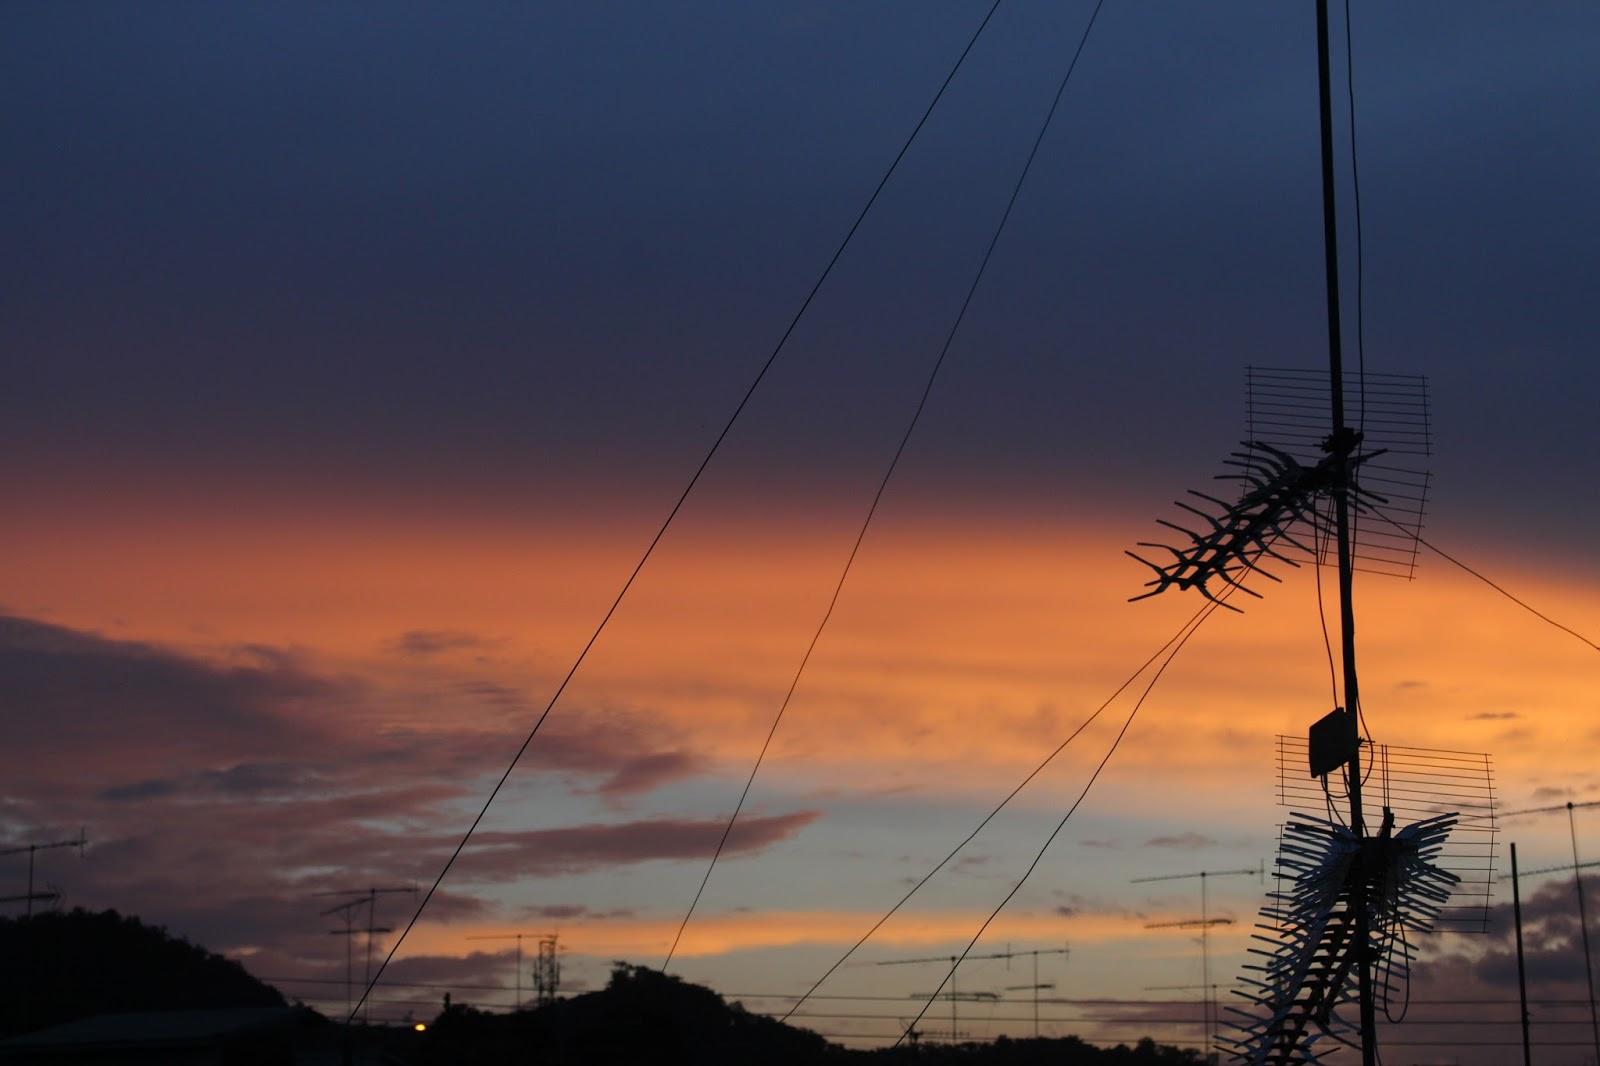 Koleksi Foto Dari Camera Canon EOS 700 D